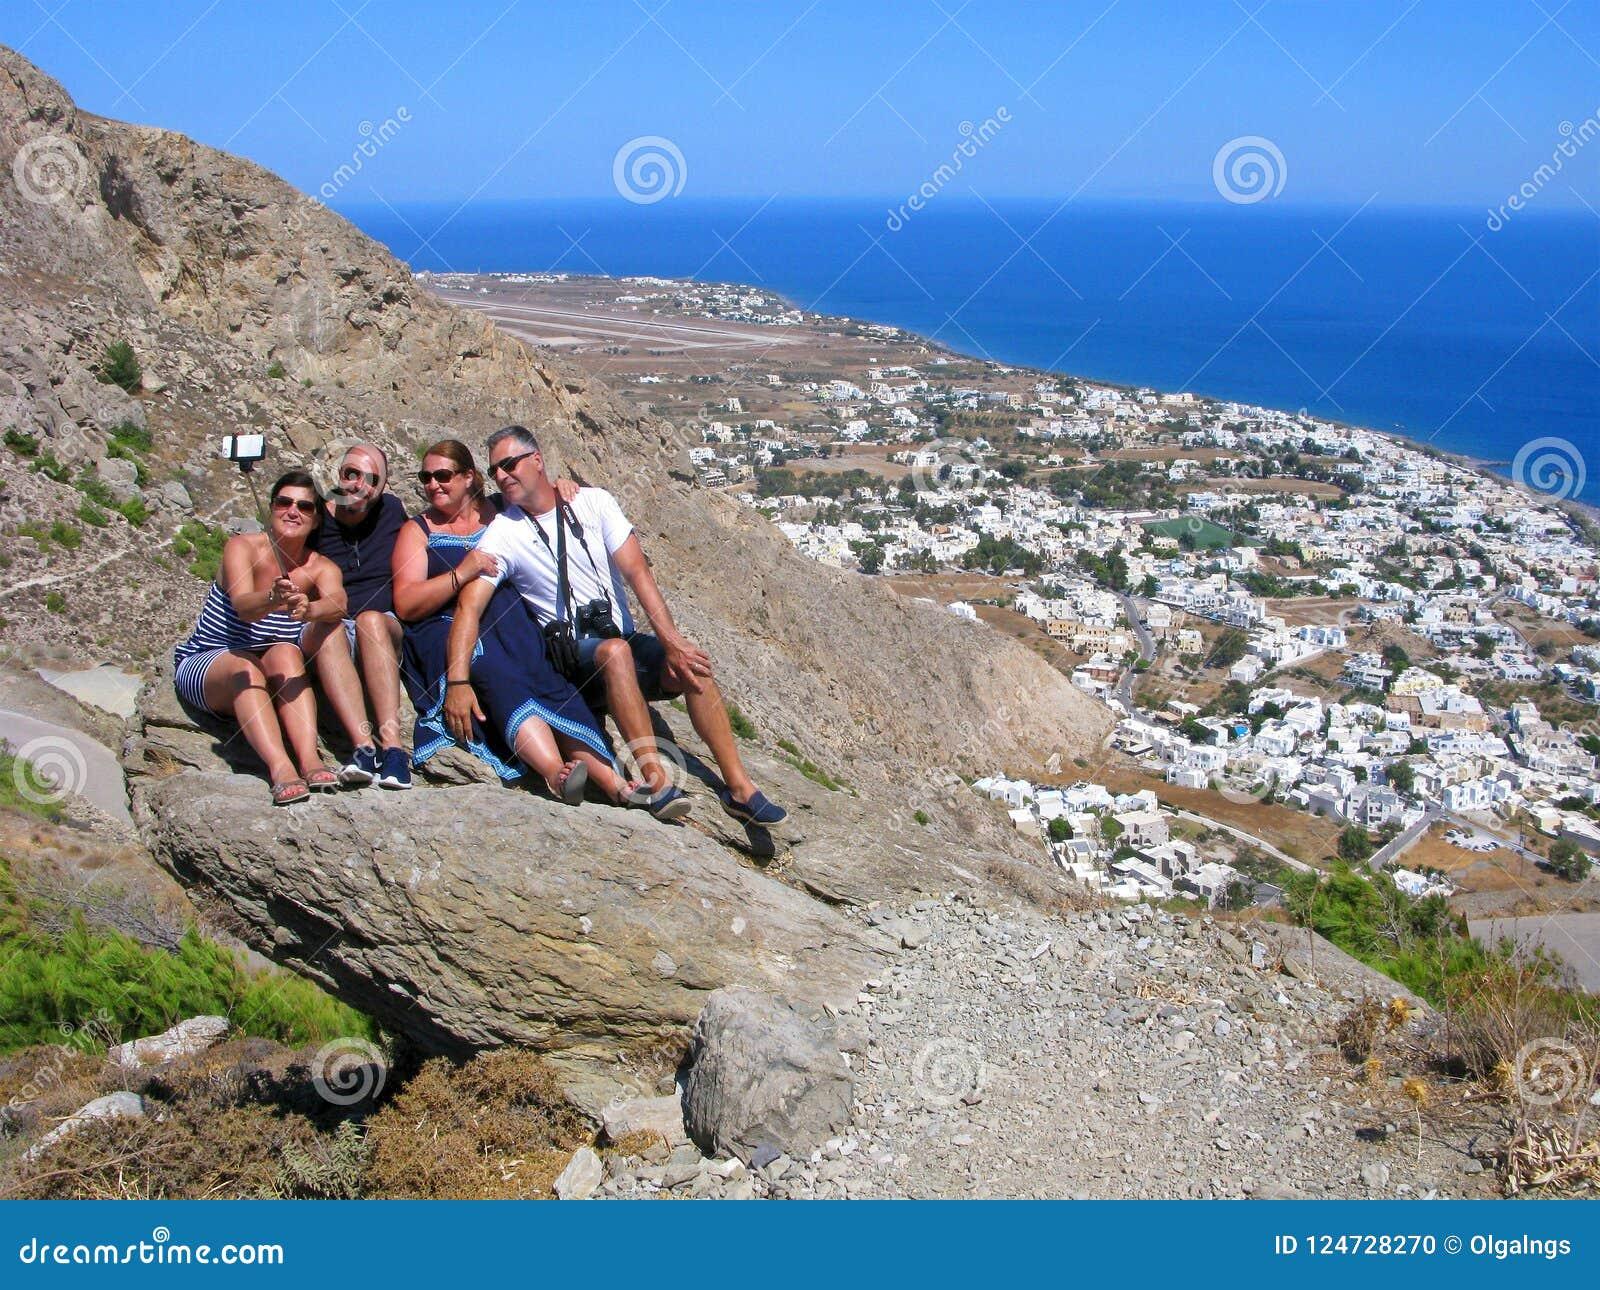 Smiling people, Greece, Santorini, selfie, top view of Kamari beach